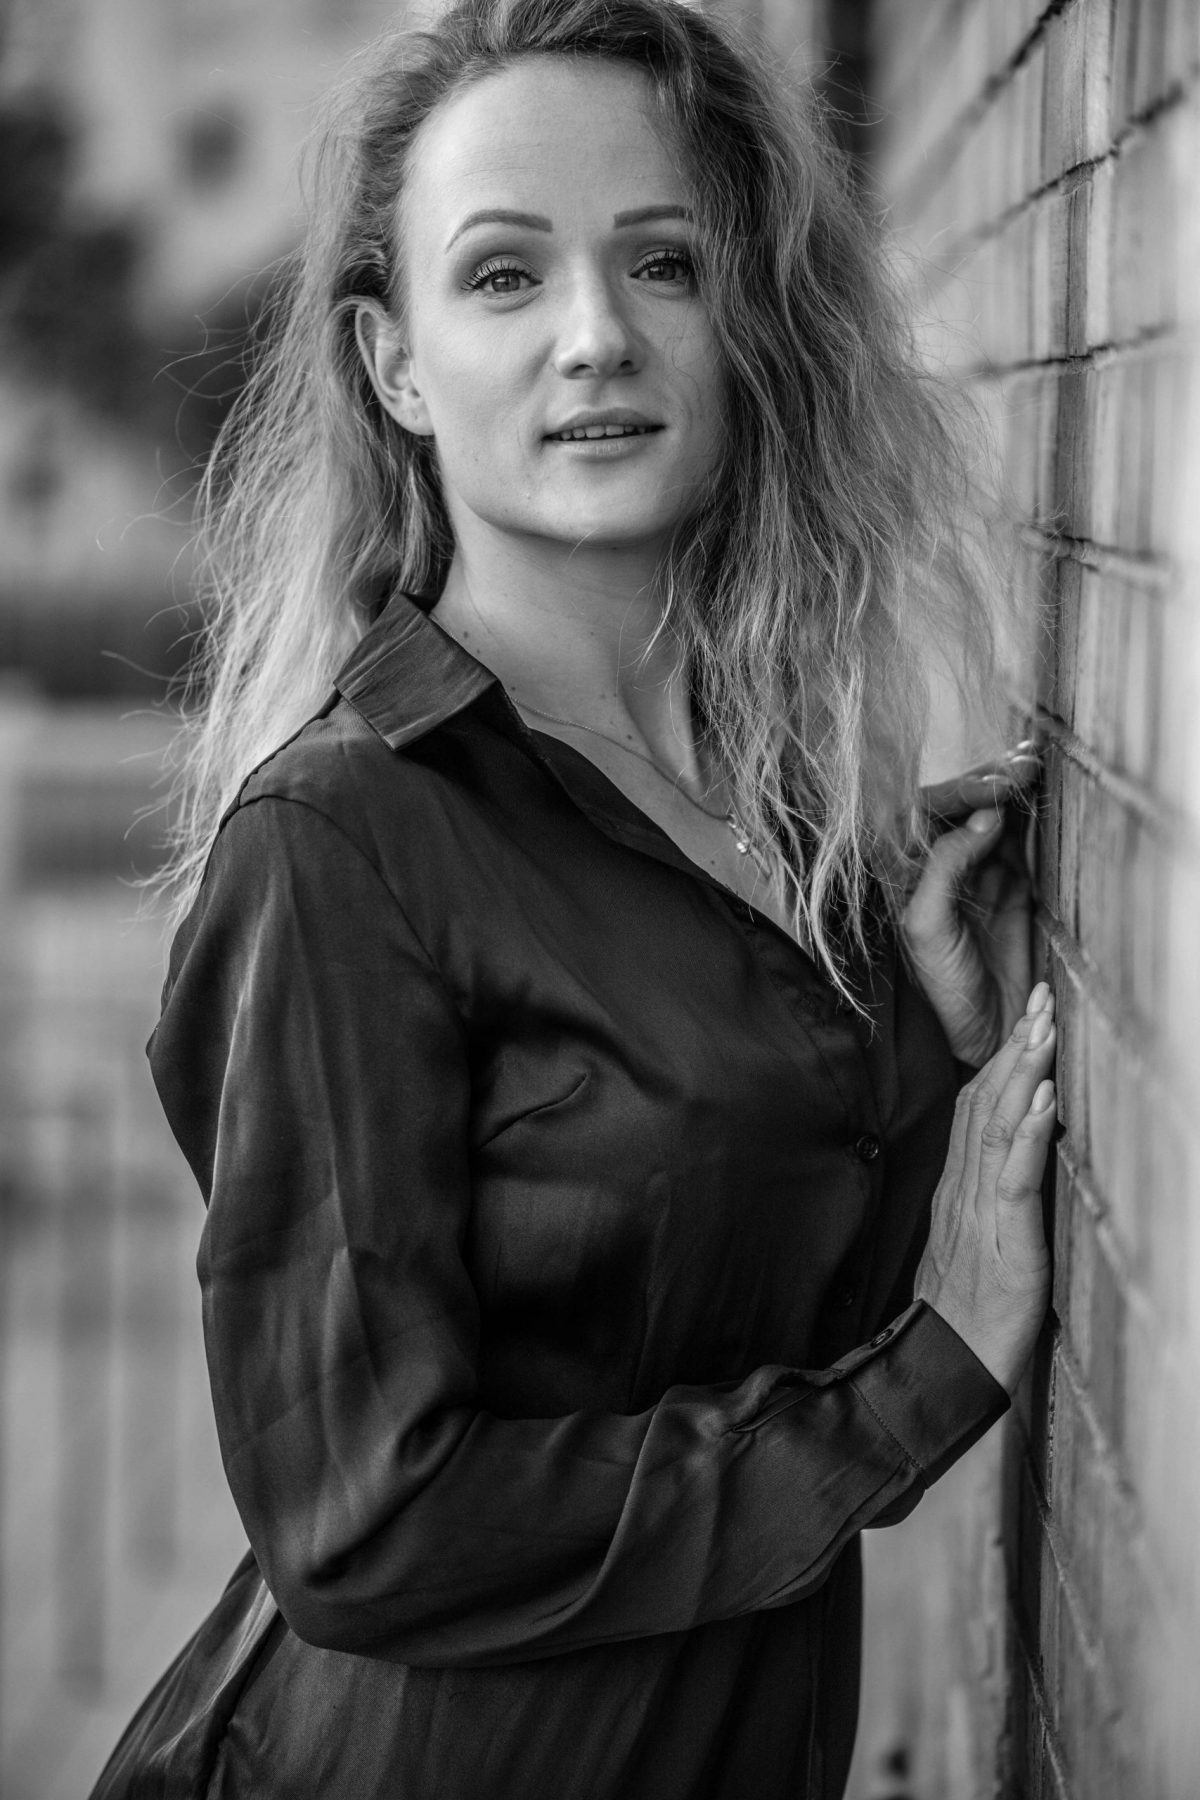 mtubach Photografie | Portraitshooting Dajana